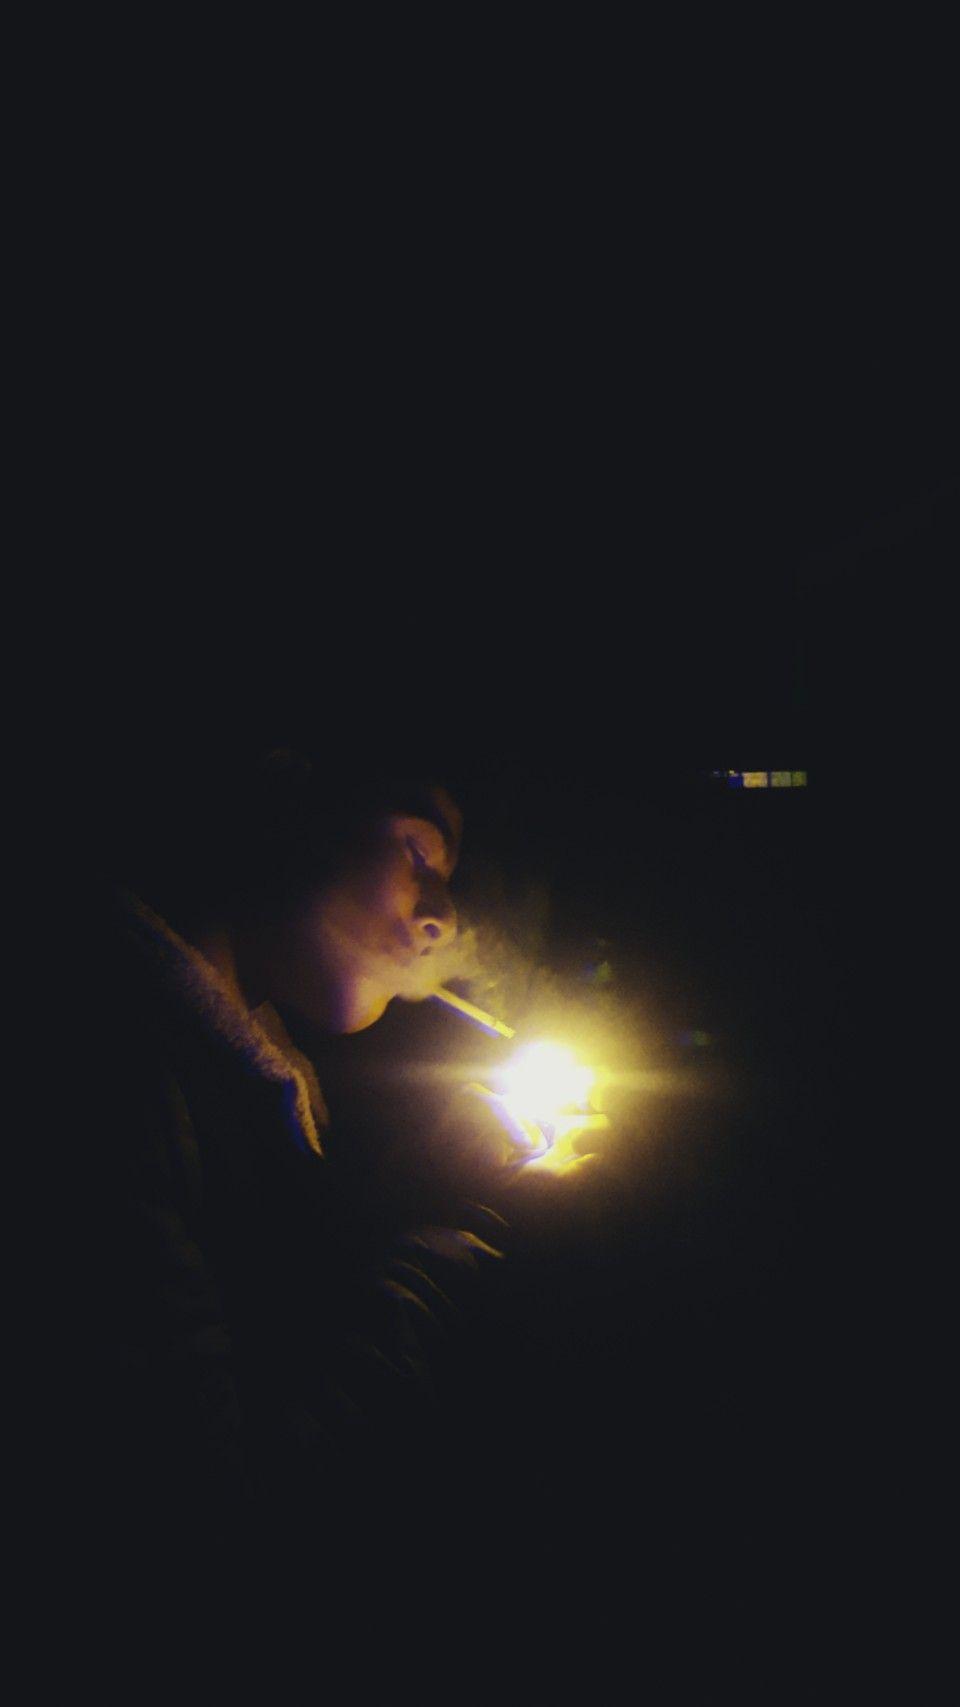 smoking in a rain in a darkniss | mood | Smoke, Sunset, Rain